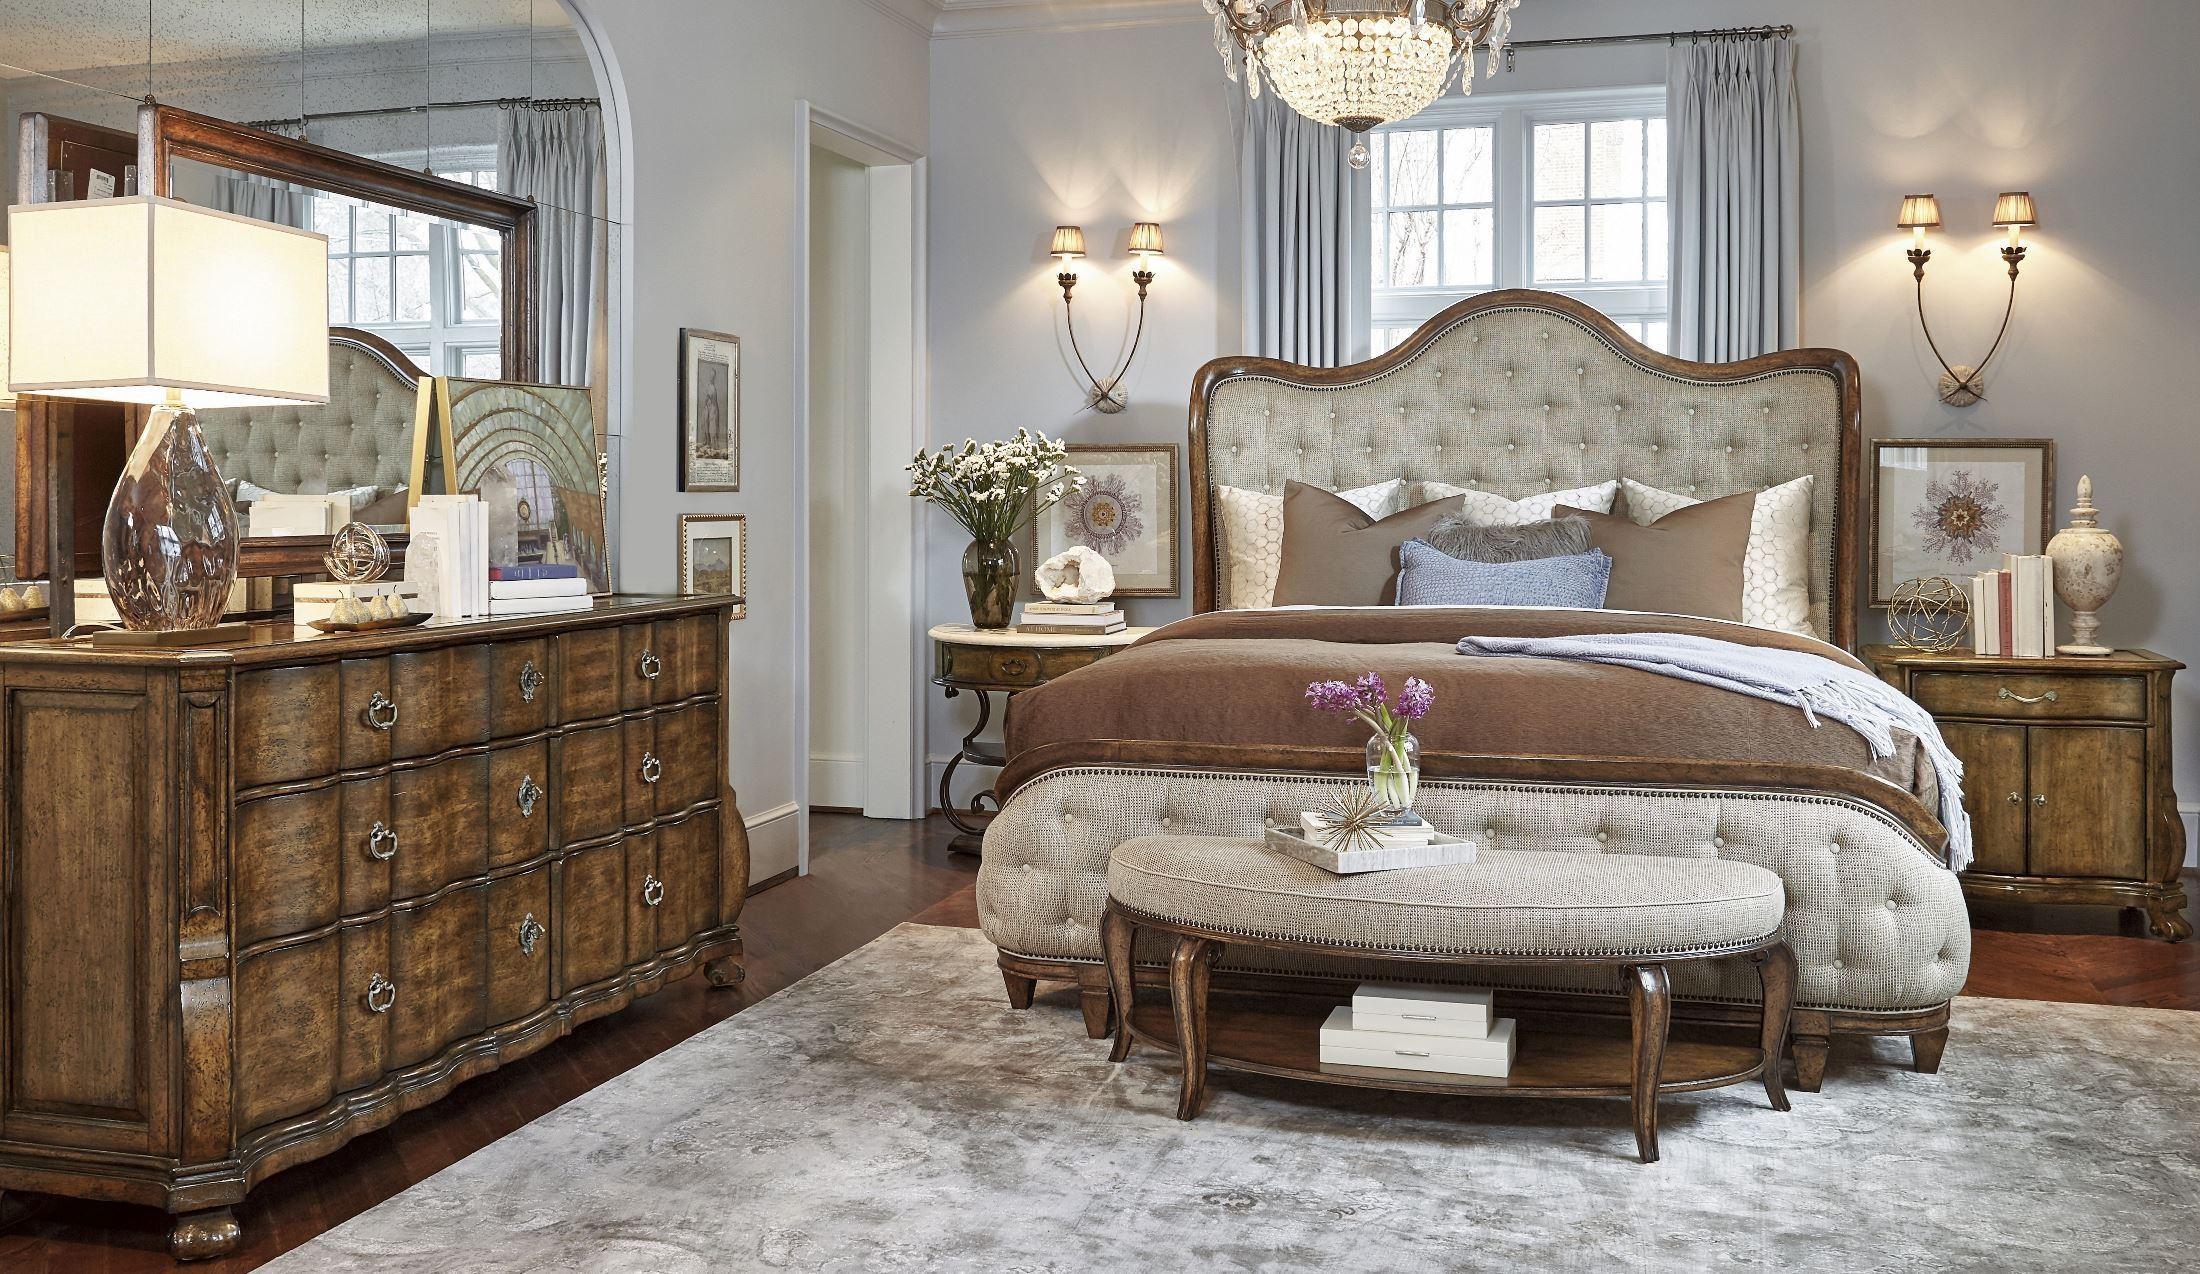 Continental Weathered Nutmeg Upholstered Shelter Bedroom Set From Art Coleman Furniture